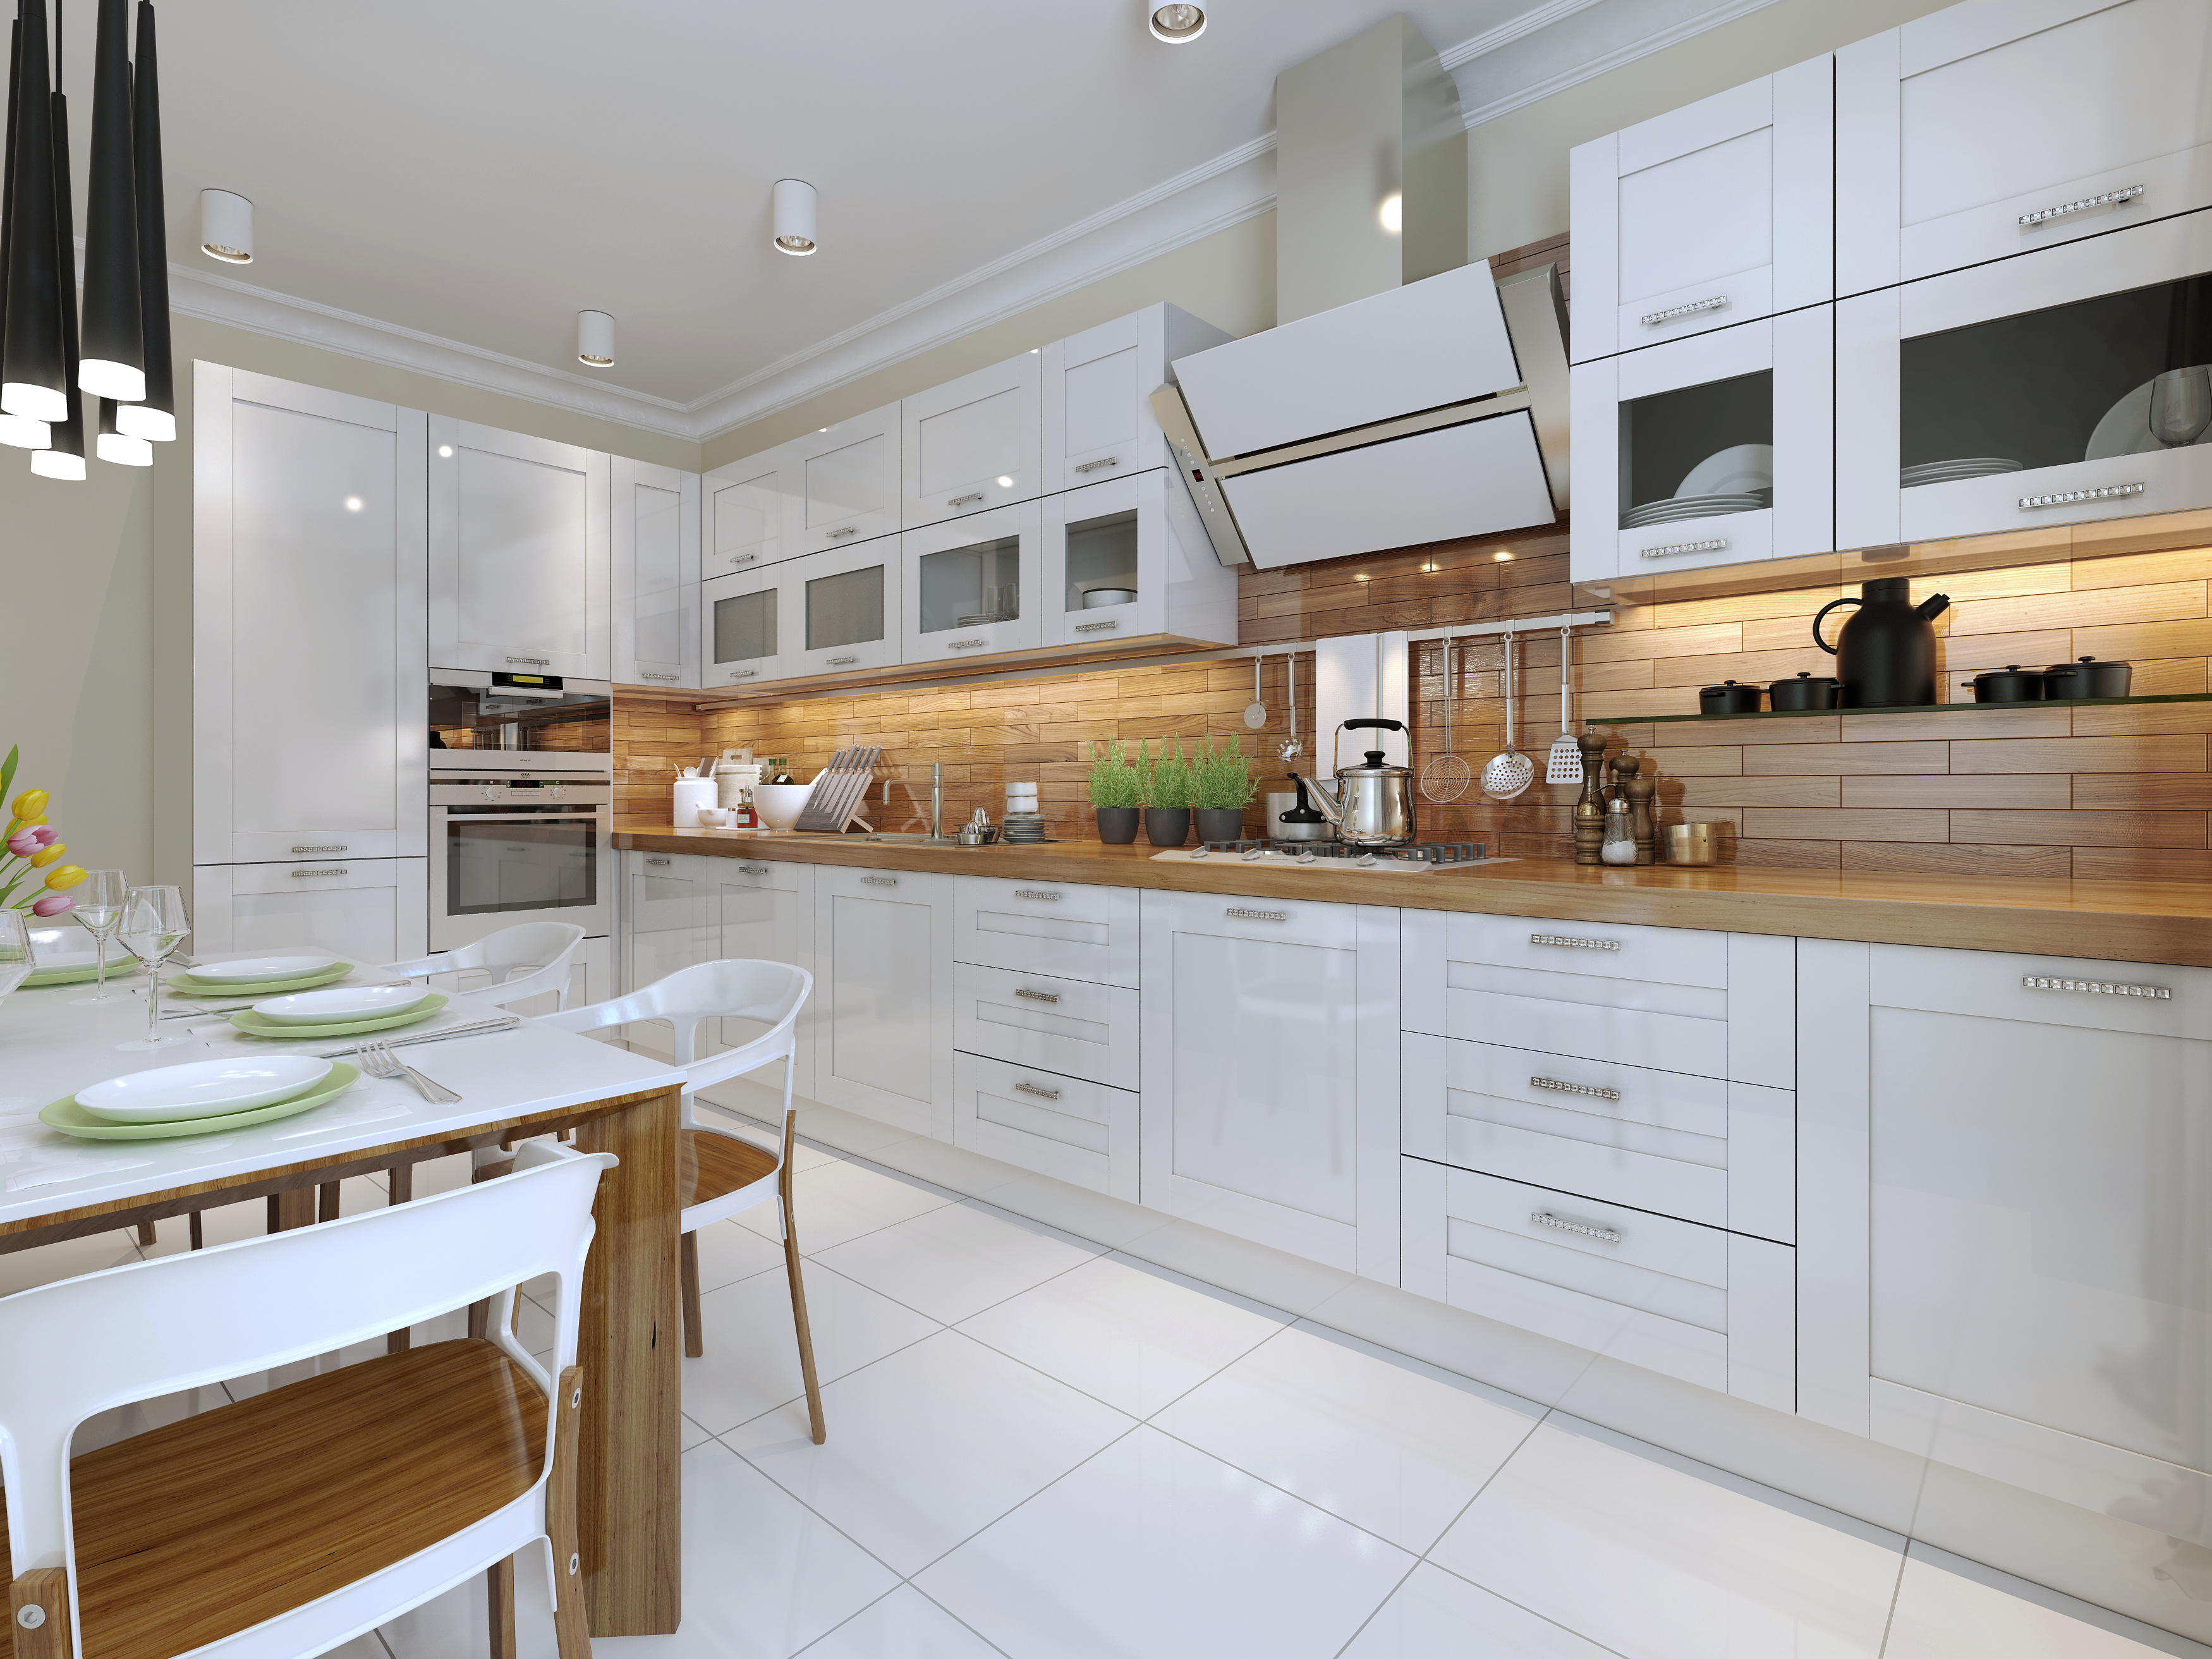 Wonderful Traditional Kitchen - Violet Designs 600 x 533 · 79 kB · jpeg